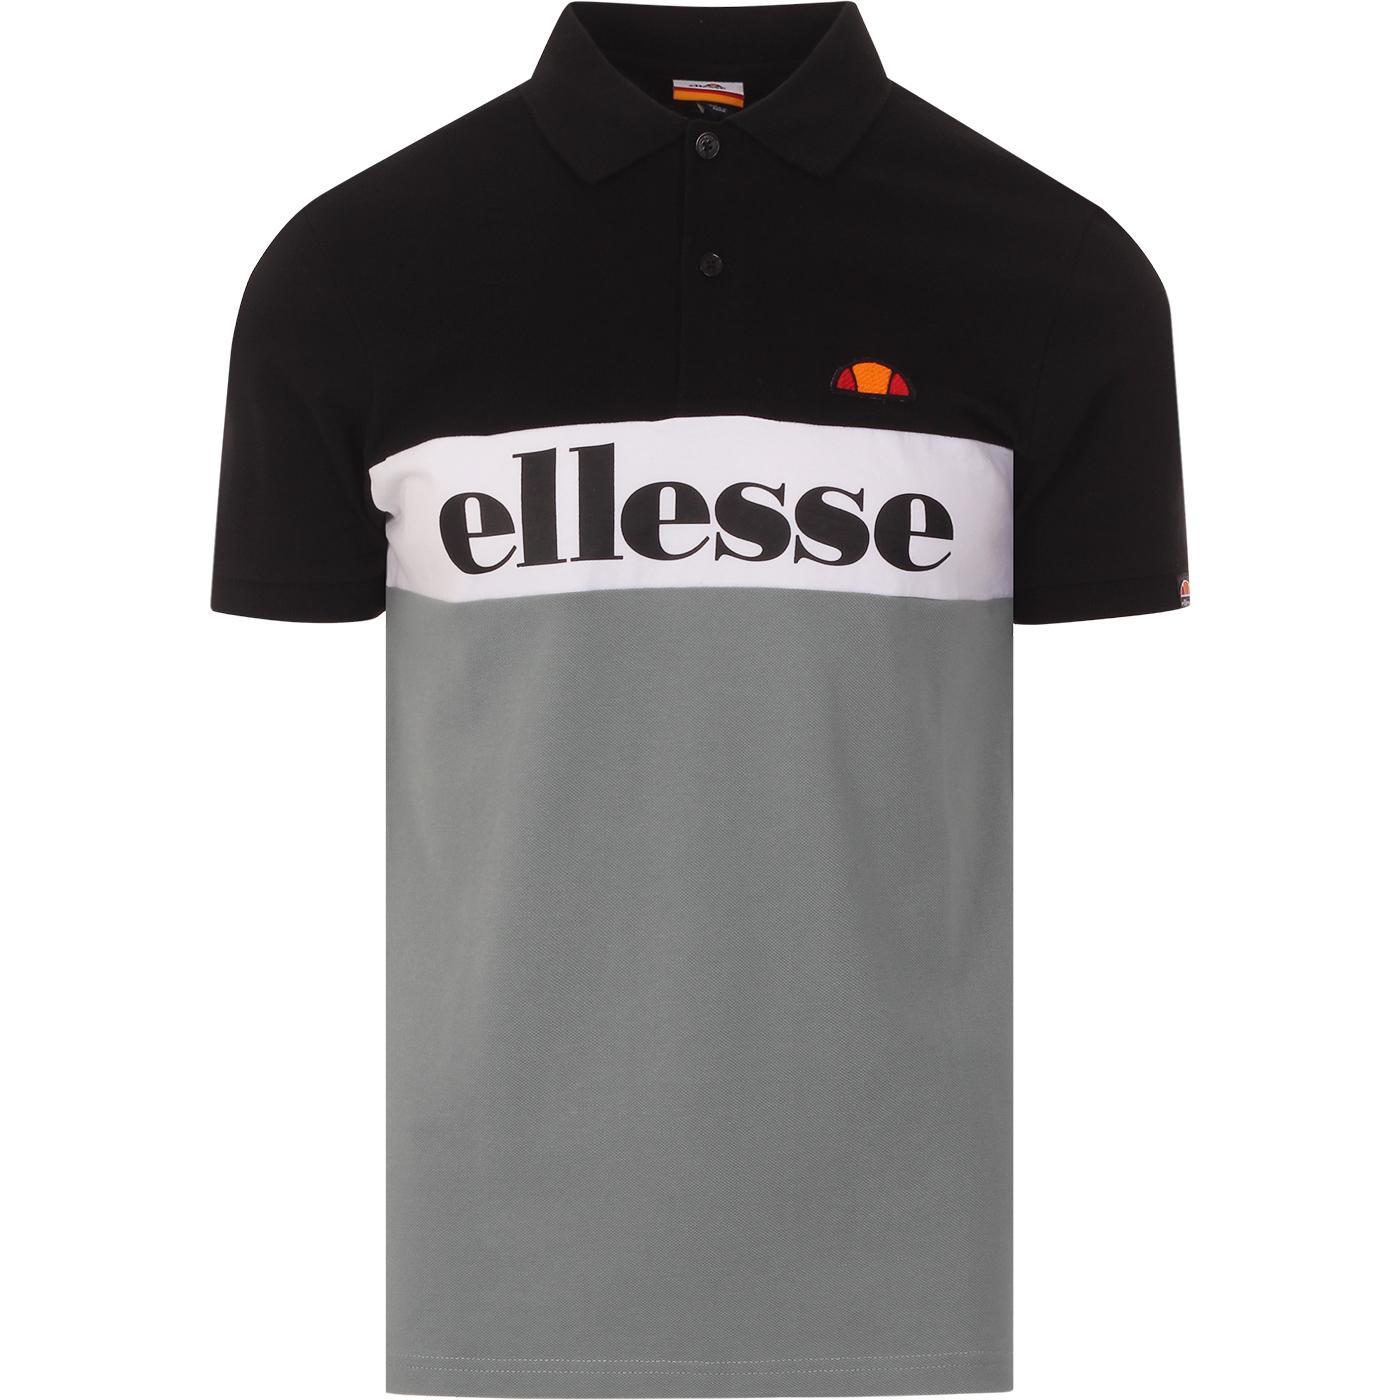 Rio ELLESSE Retro 90s Colour Block Polo Top BLACK